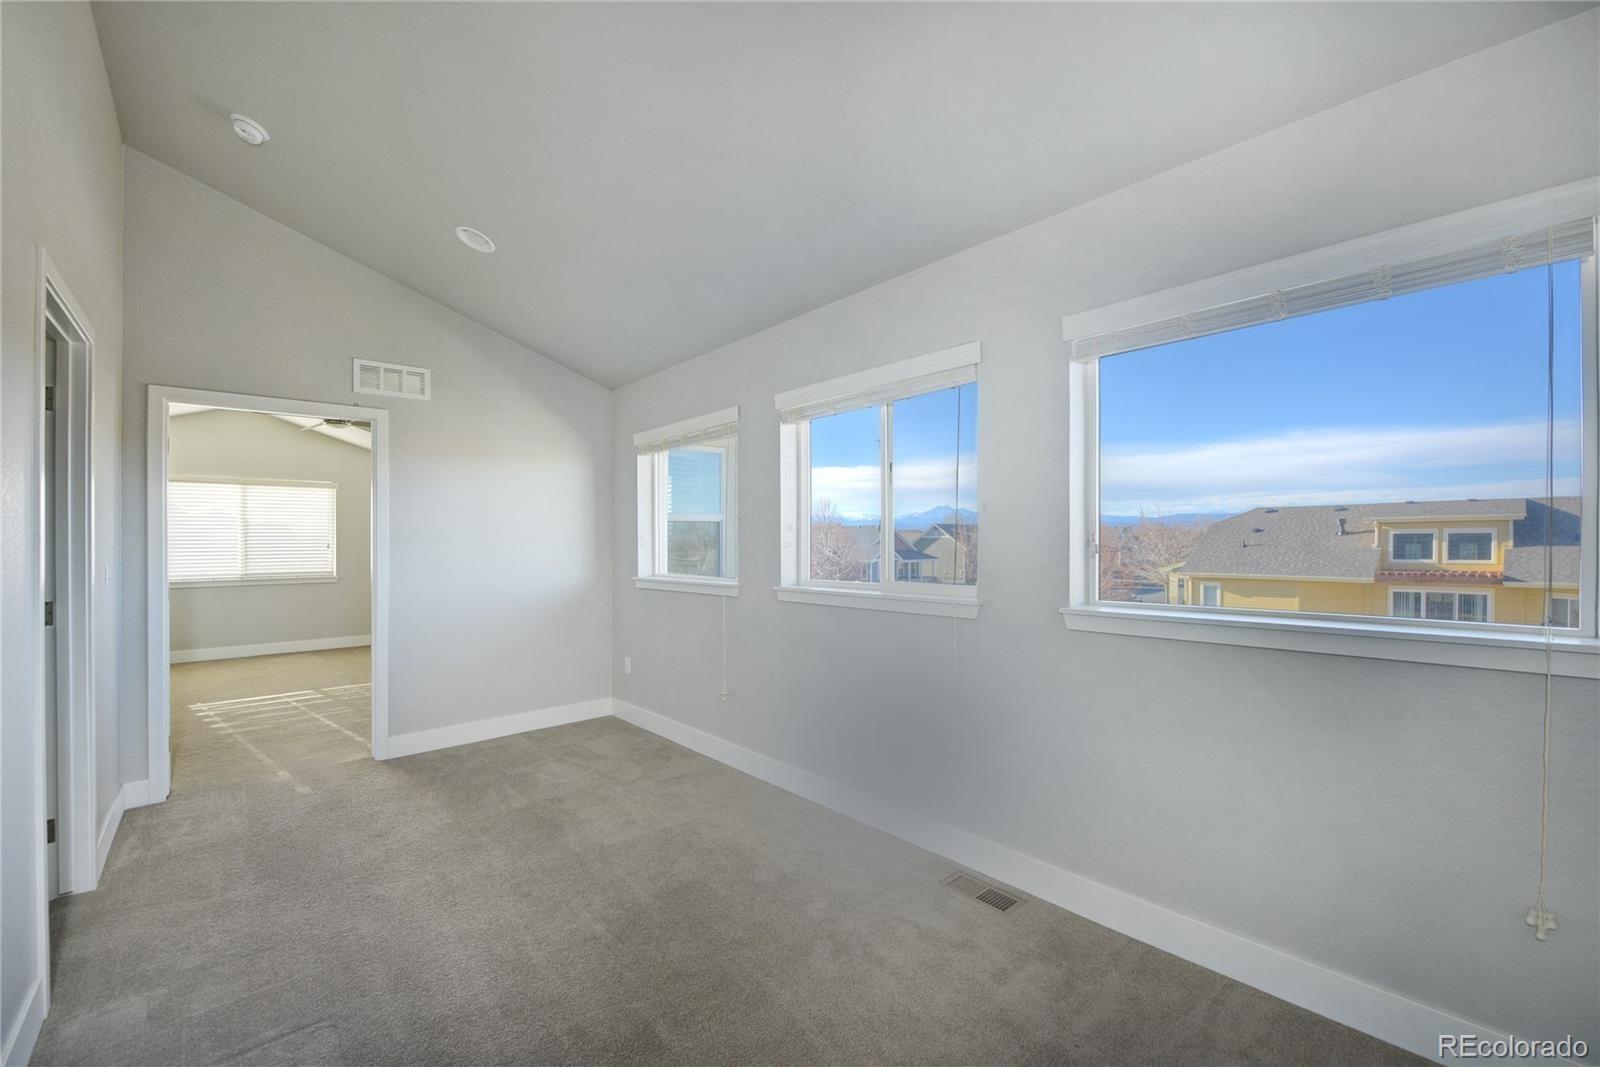 MLS# 3928660 - 16 - 1444 Moonlight Drive, Longmont, CO 80504